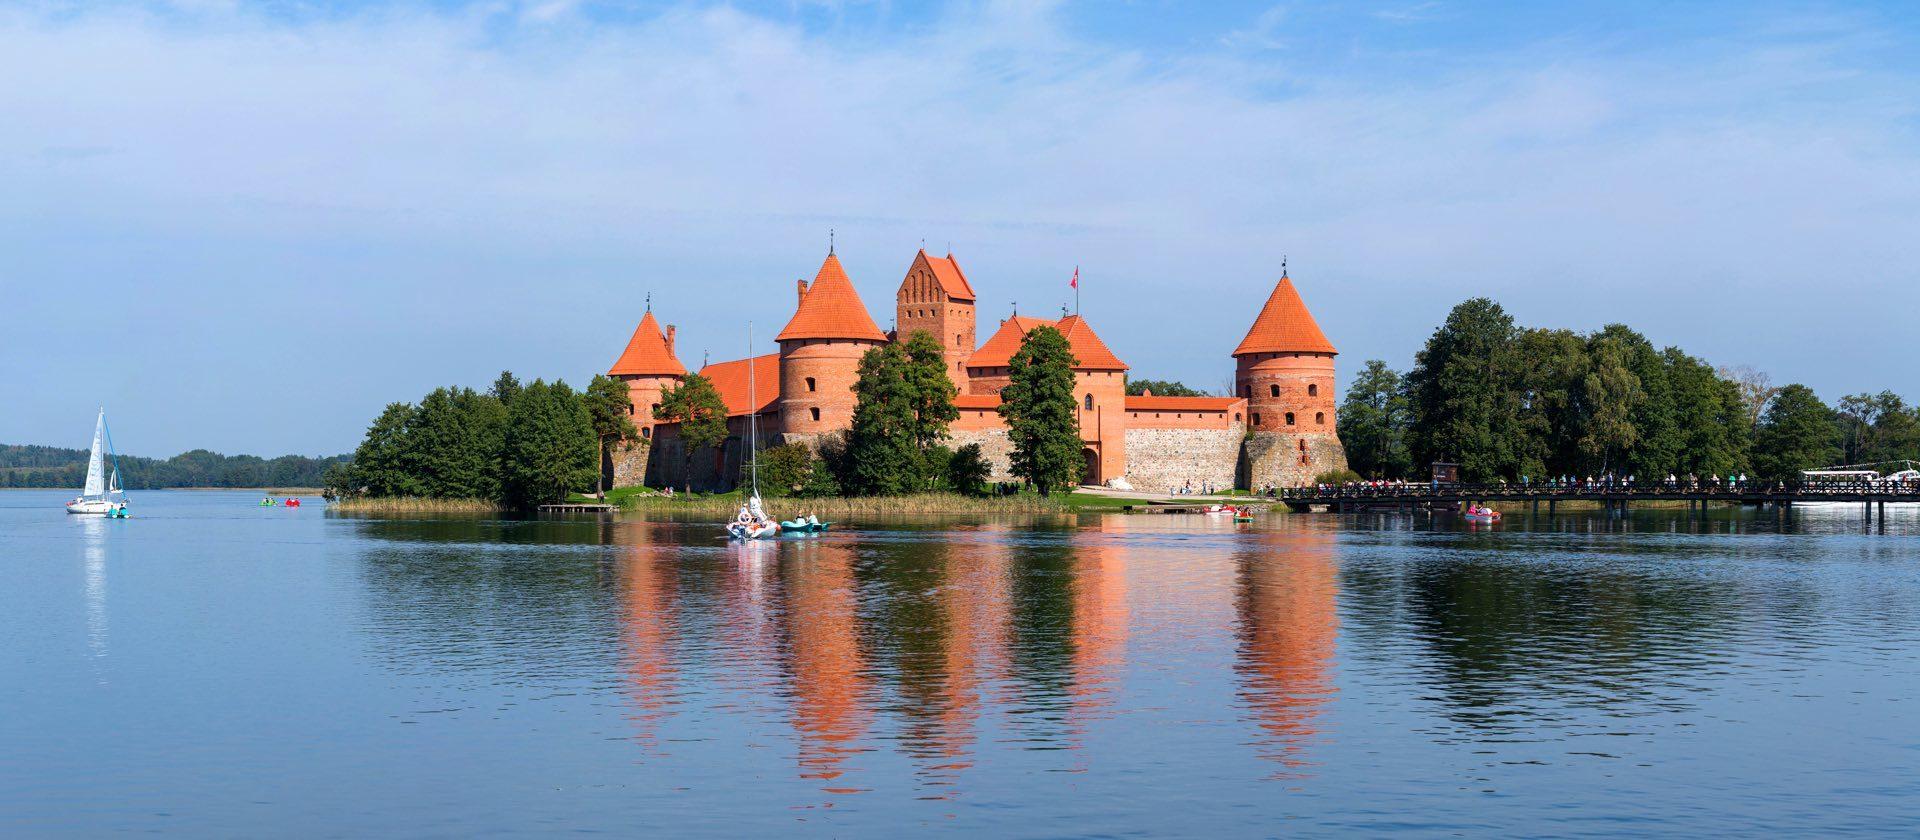 Trakai Island